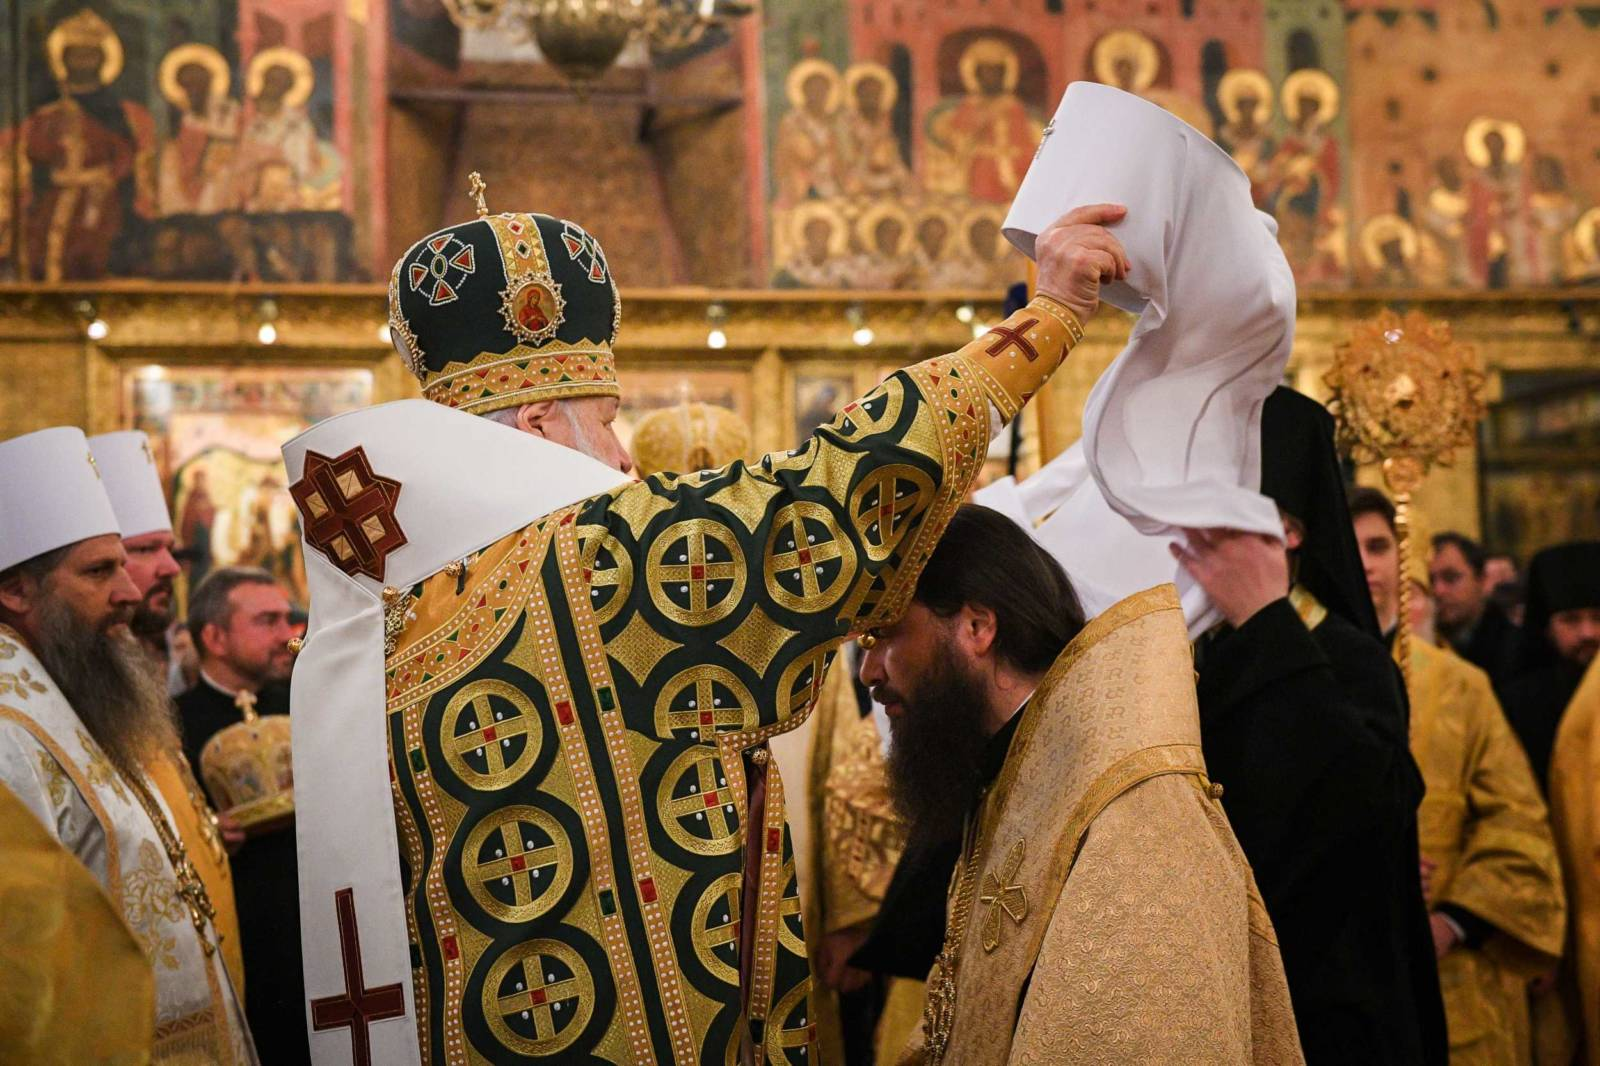 Преосвященный епископ Феодор (Казанов), возведен в сан митрополита.